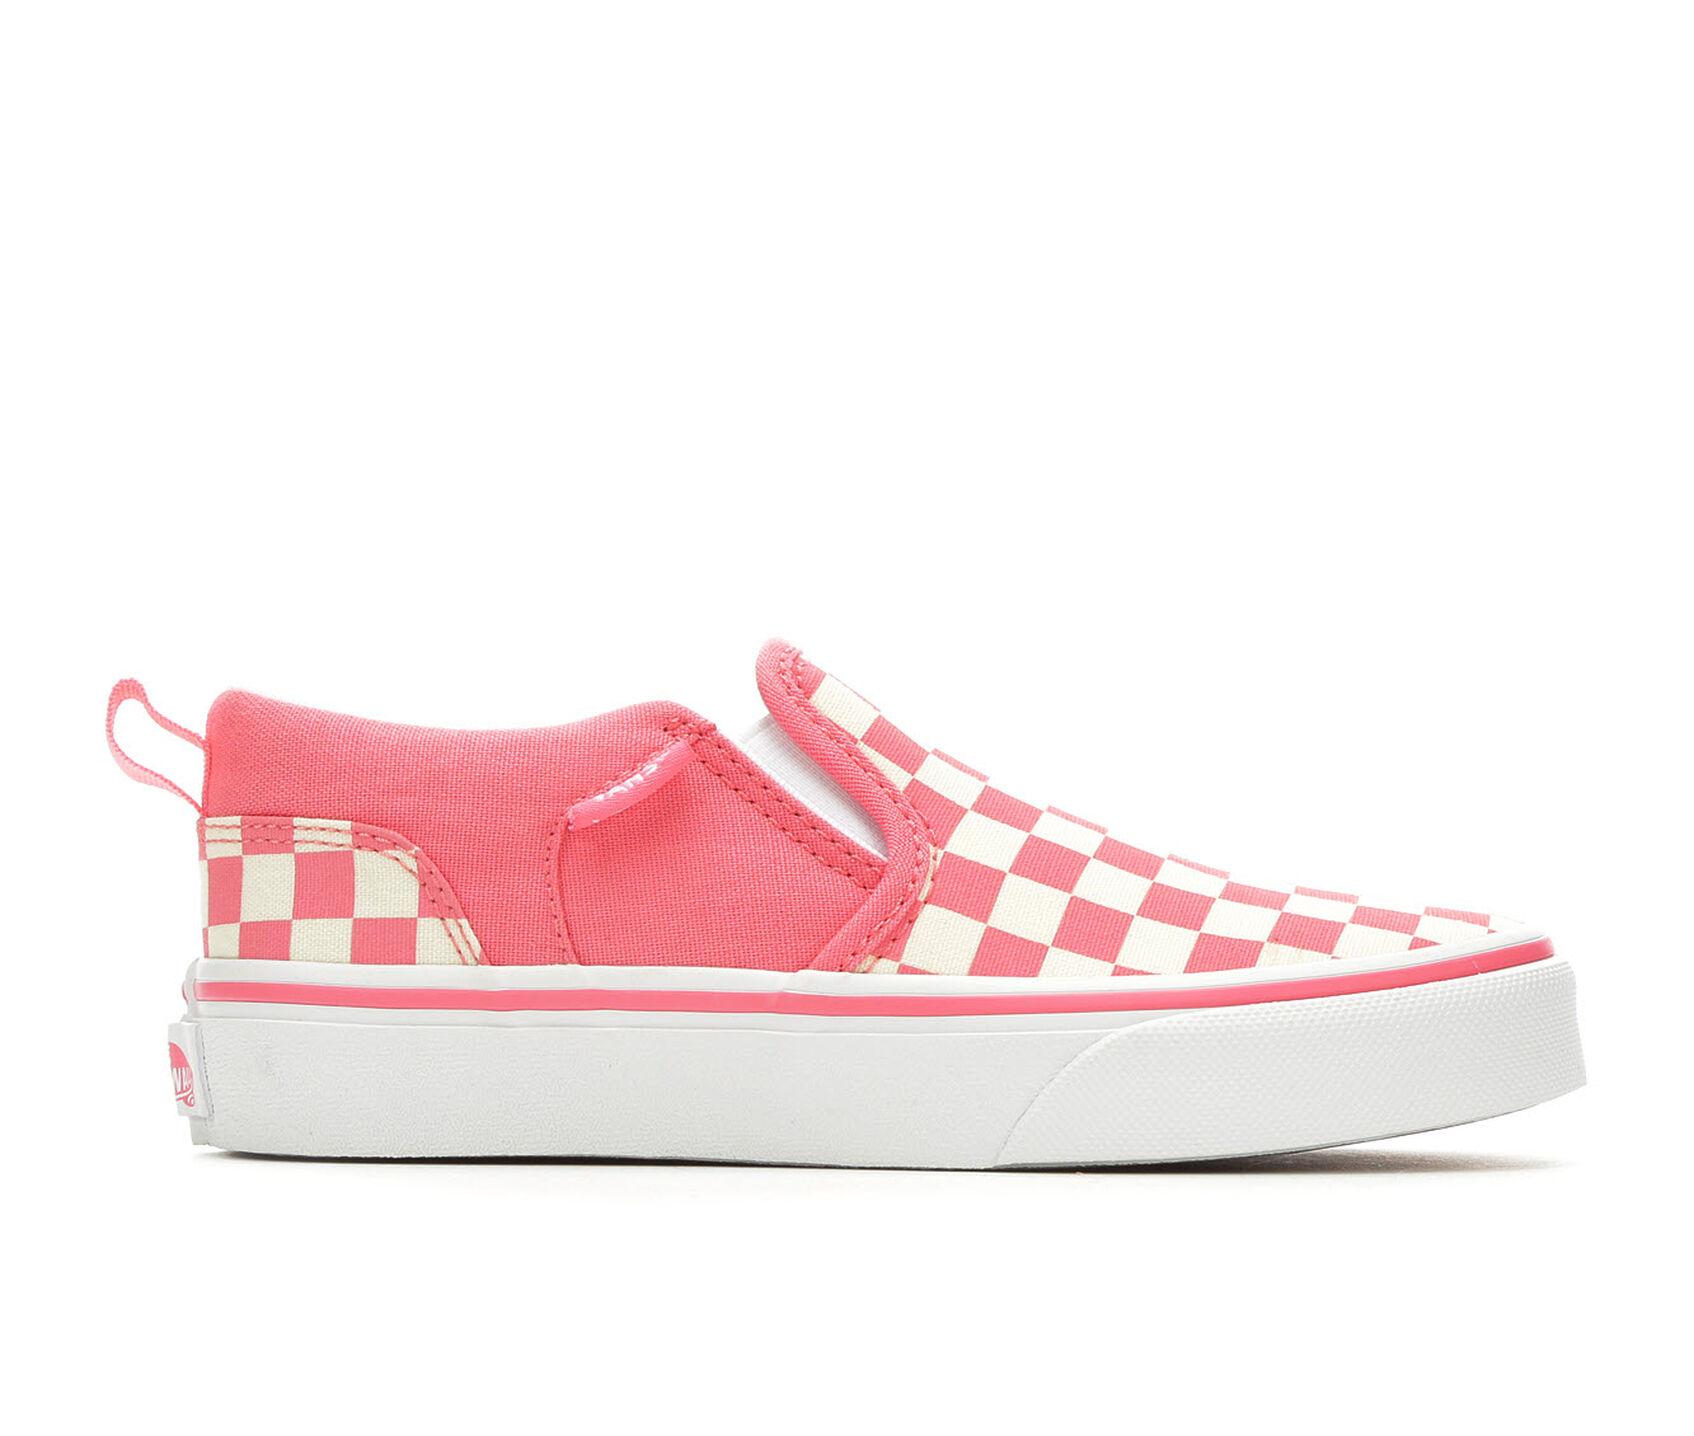 2edd4c5213efe Girls' Vans Little Kid & Big Kid Asher Slip-On Skate Shoes | Shoe ...